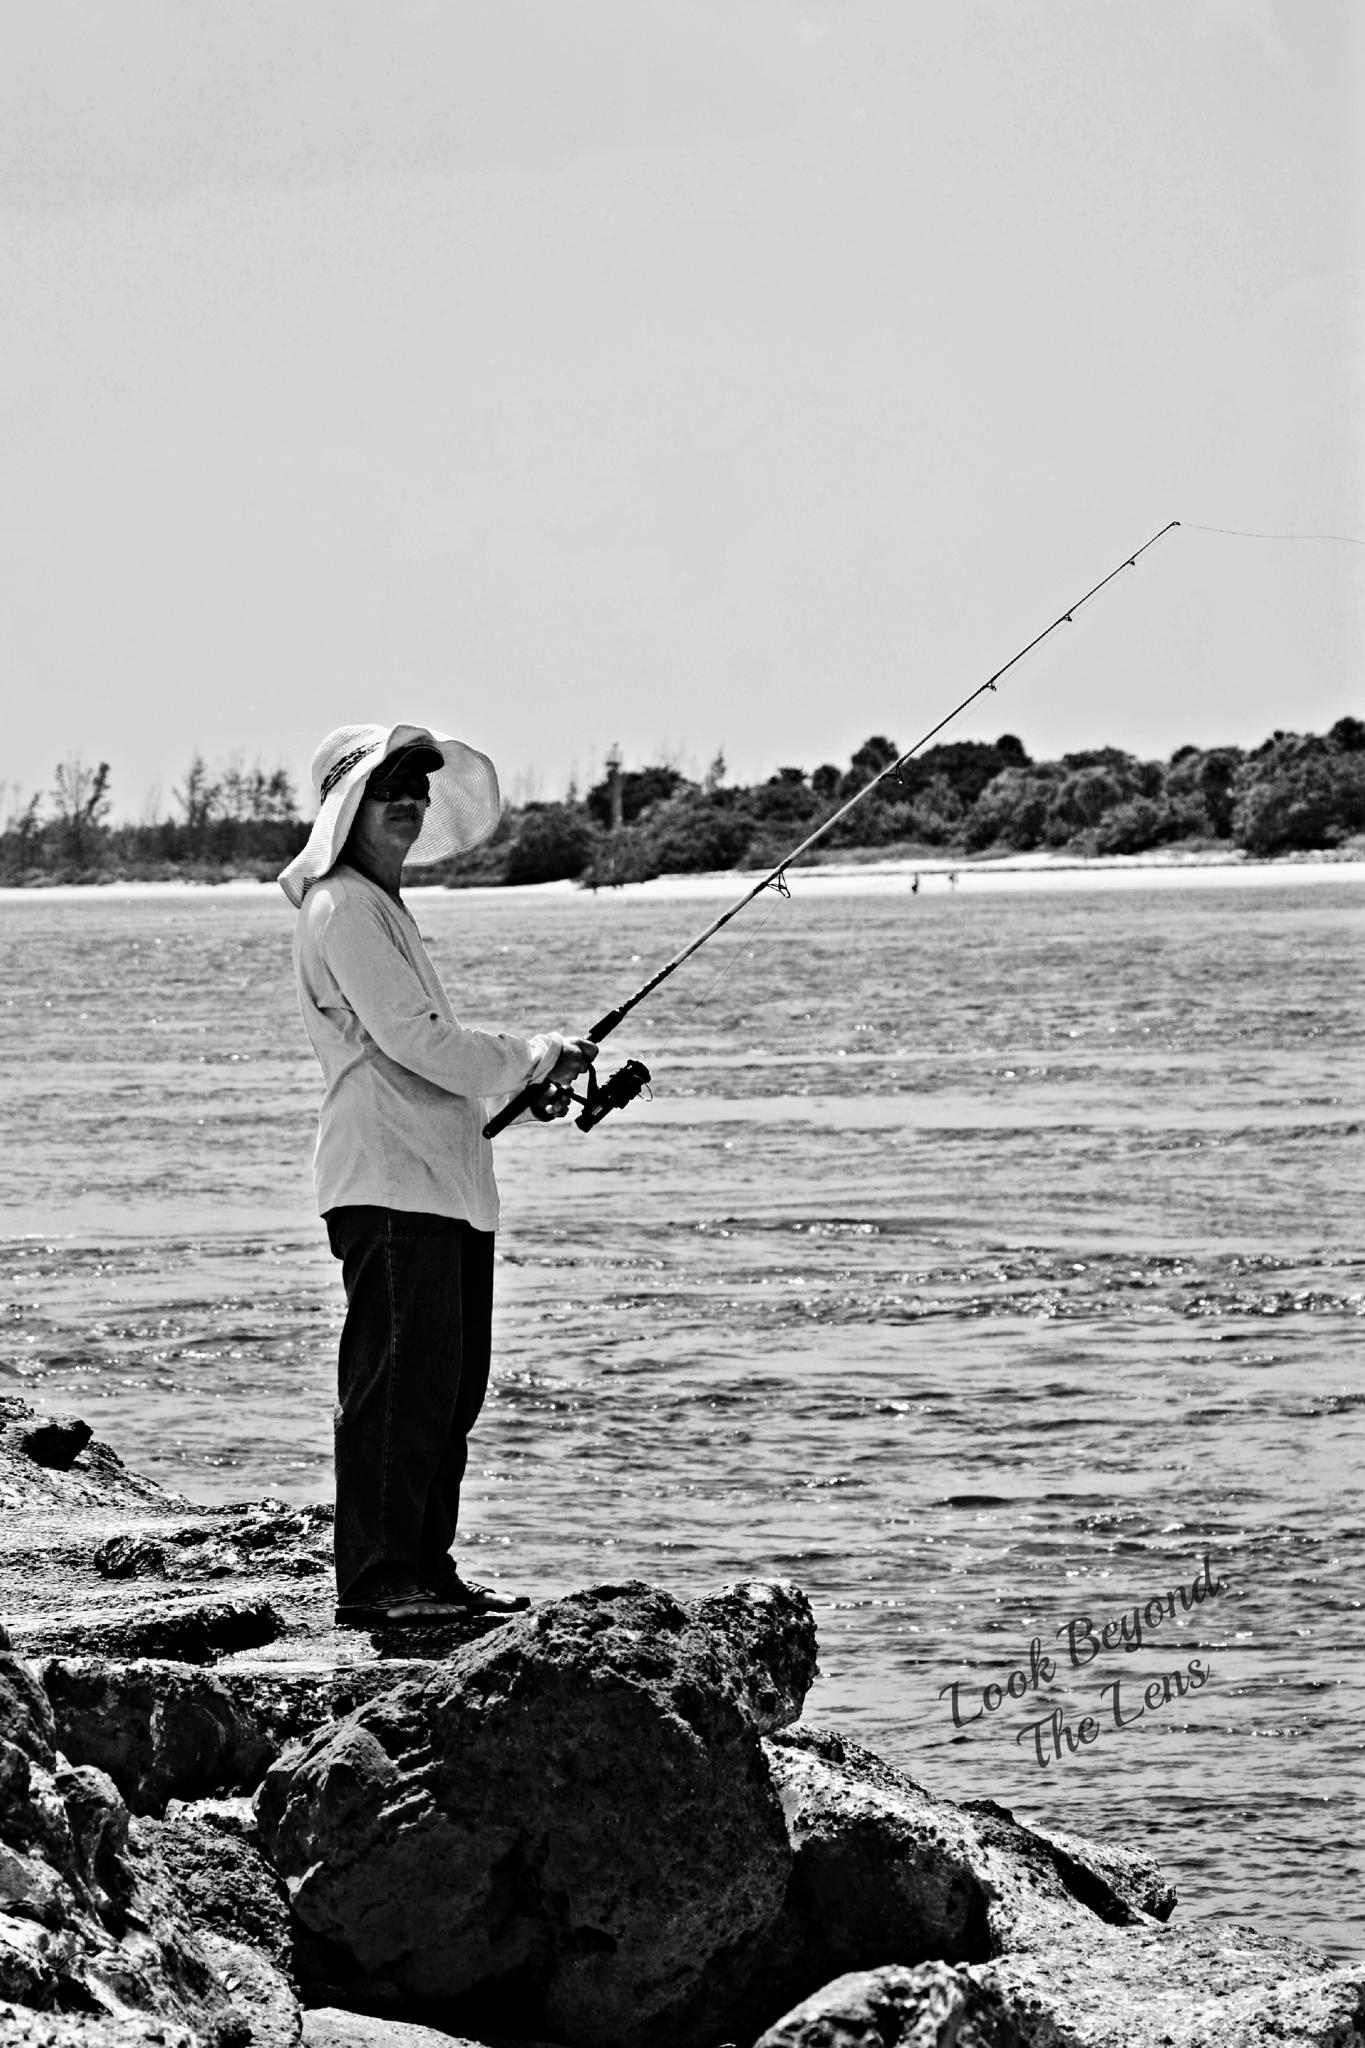 The Fisherman by sunshinerjw1